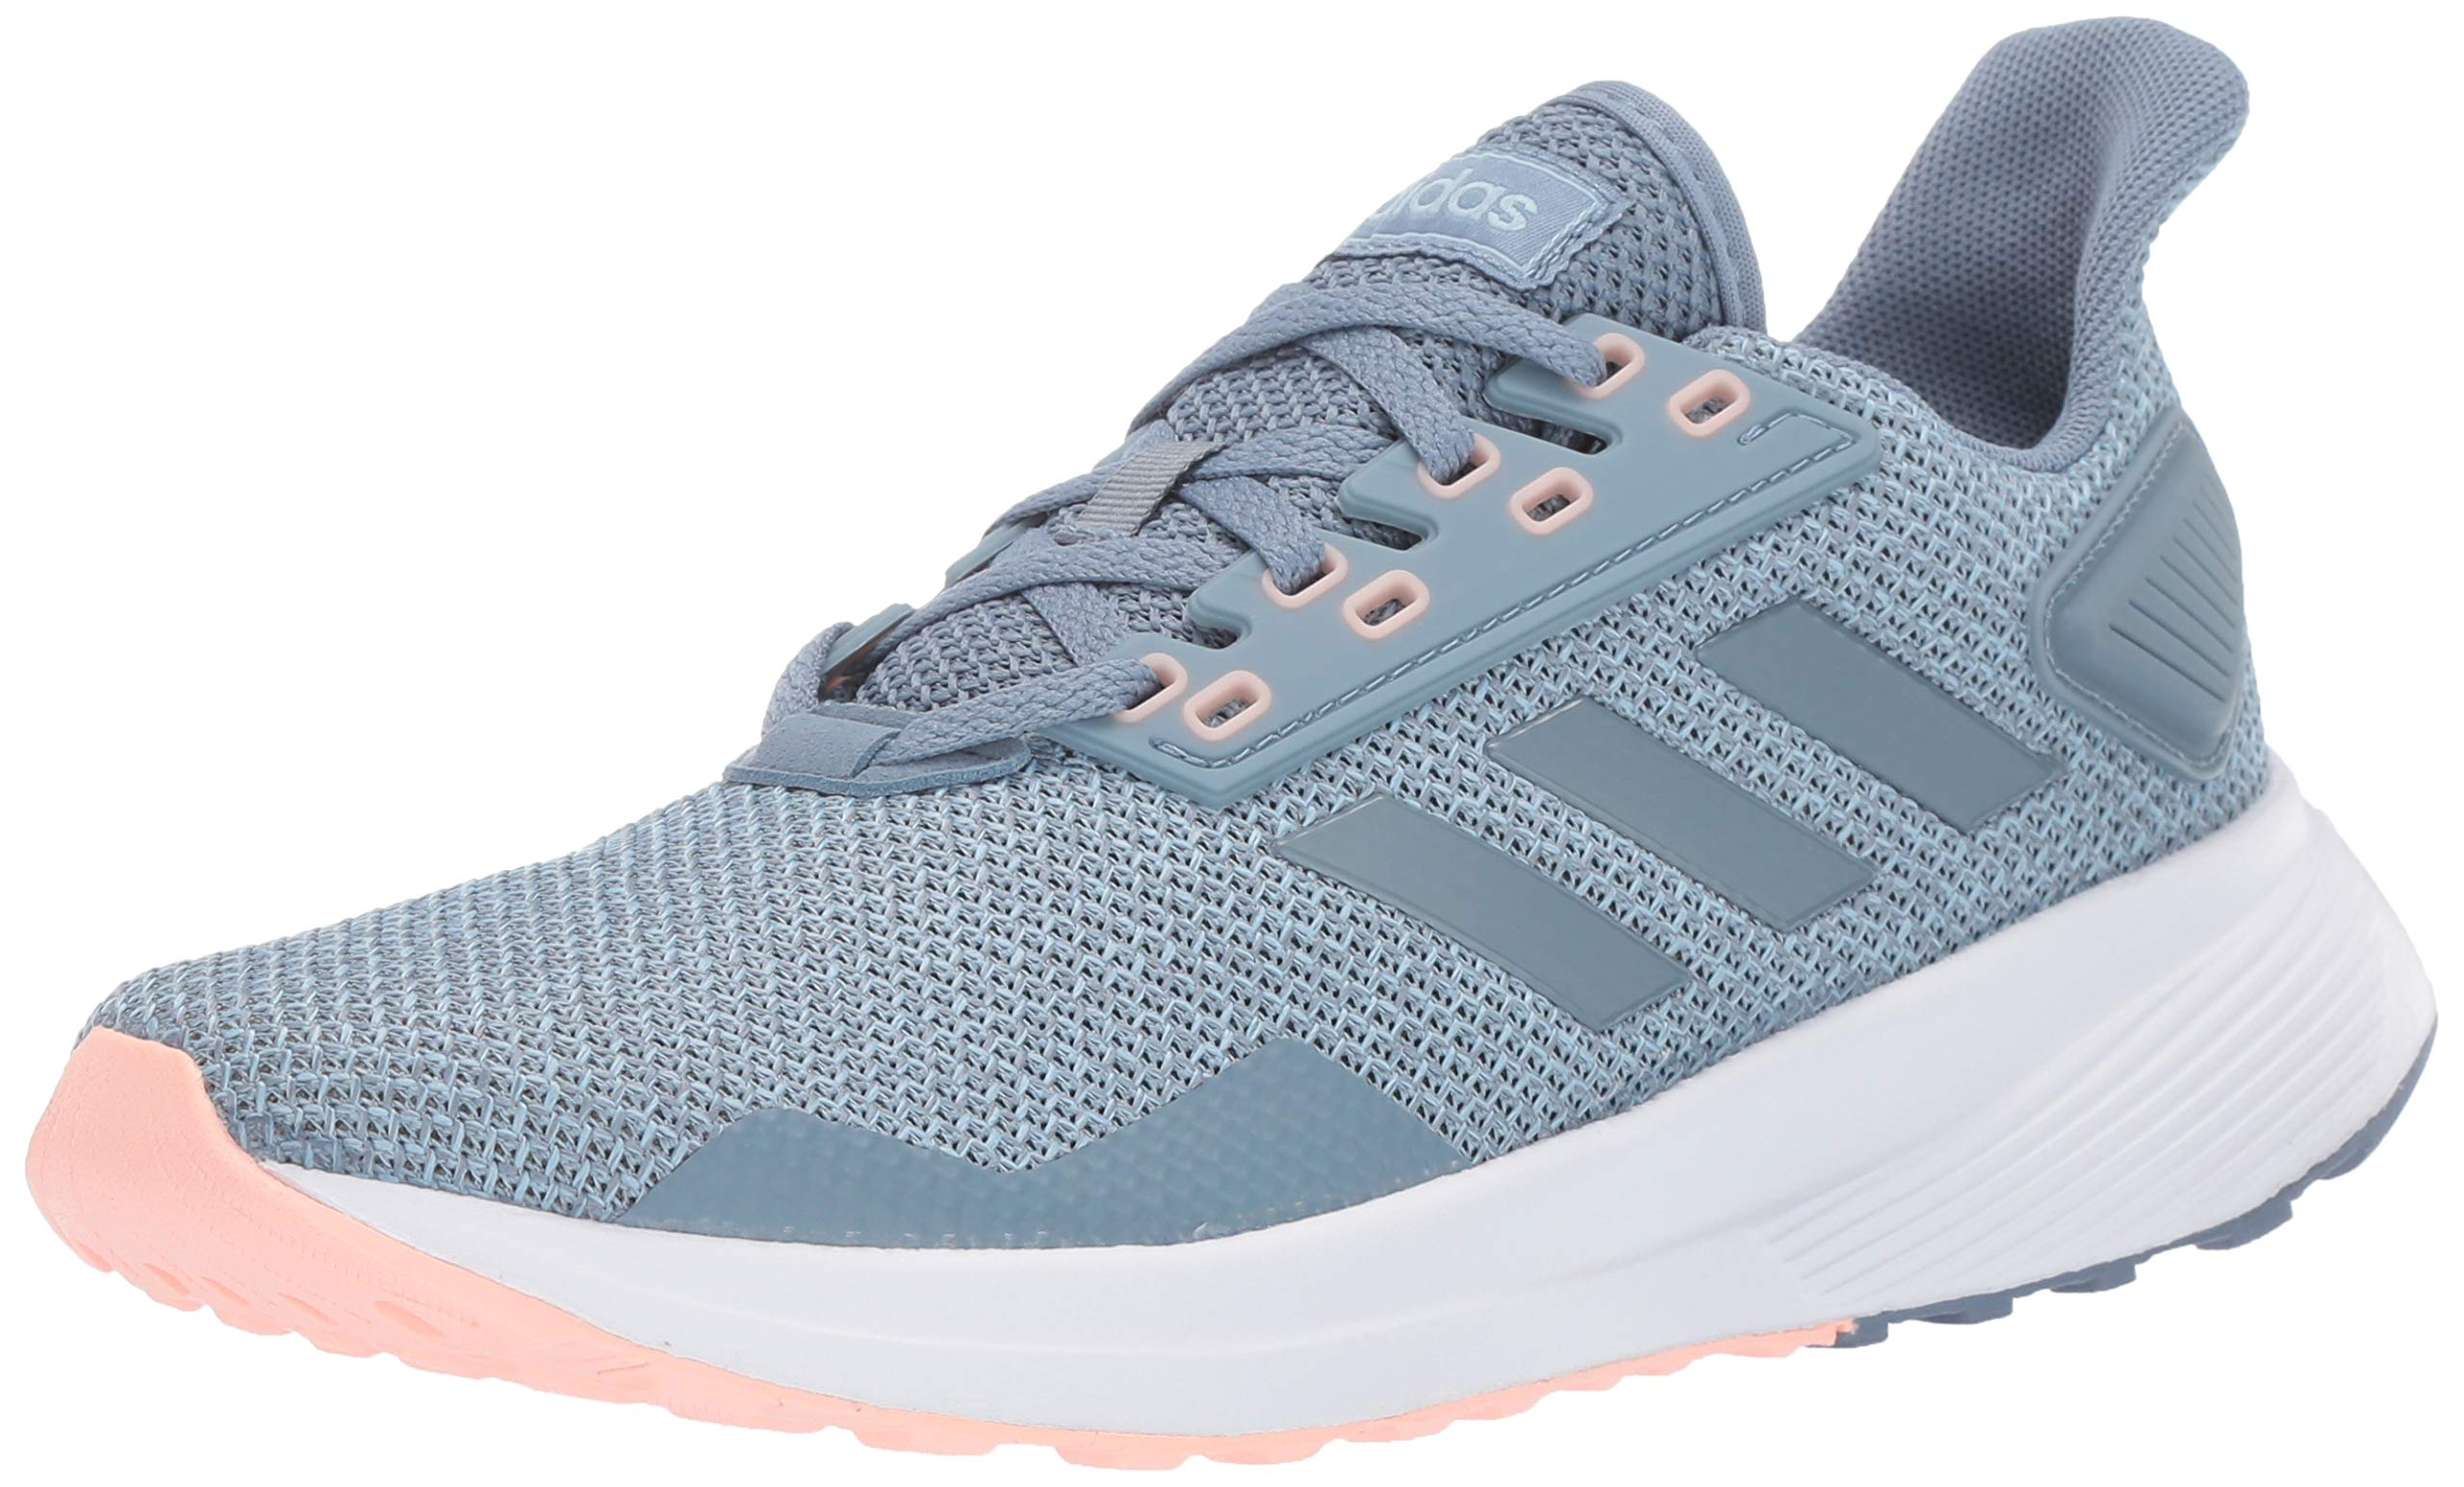 adidas Women's Duramo 9 Running Shoe, raw ash Grey, 7 M US by adidas